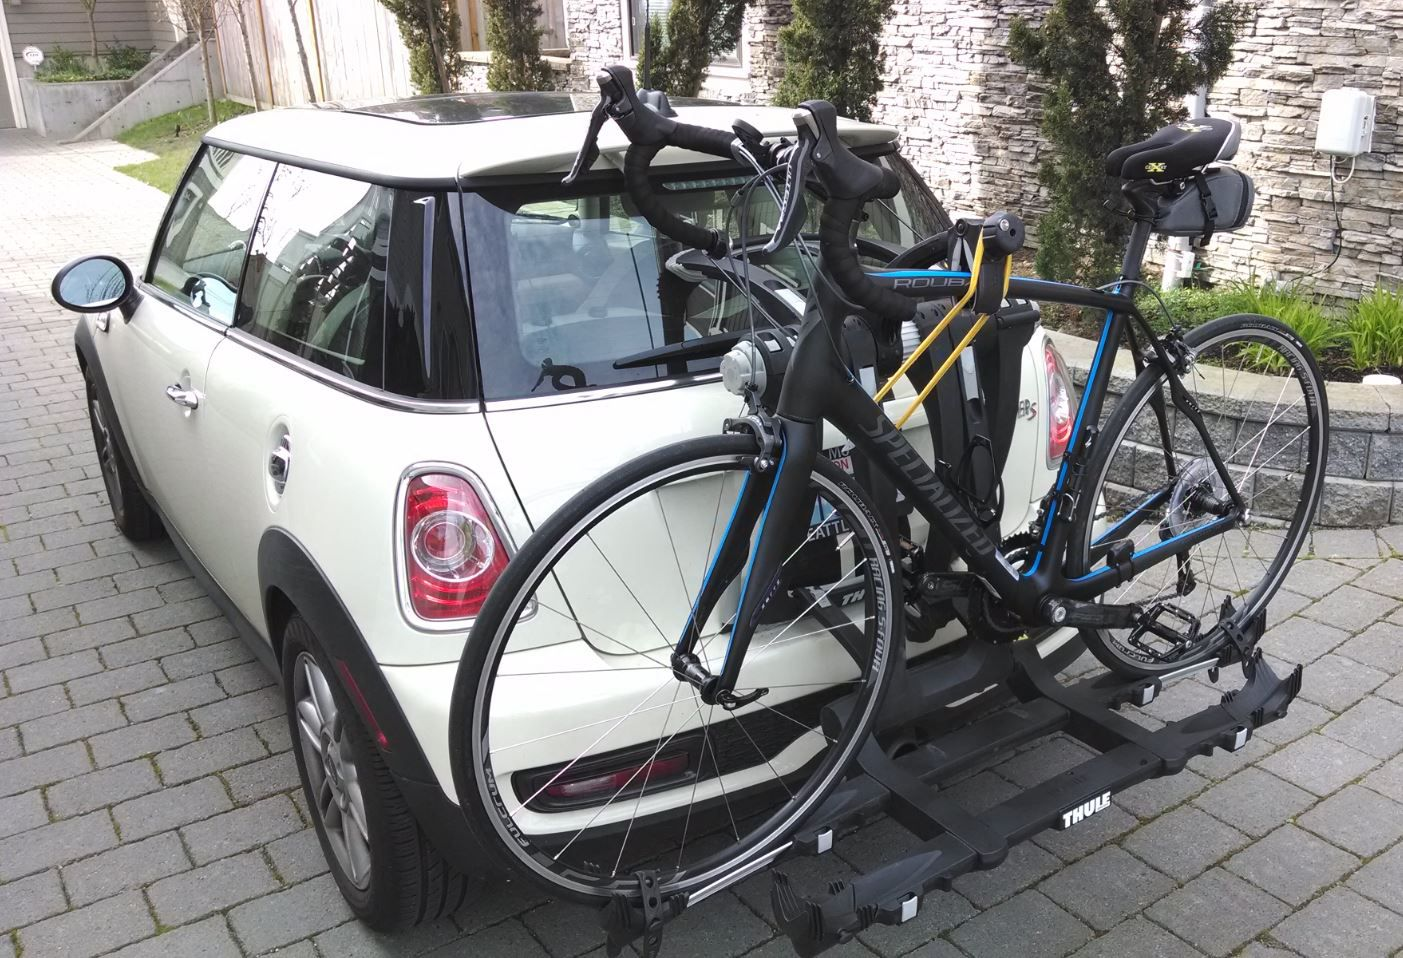 Mini Cooper S Bike Rack For A Specialized Roubaix Bike